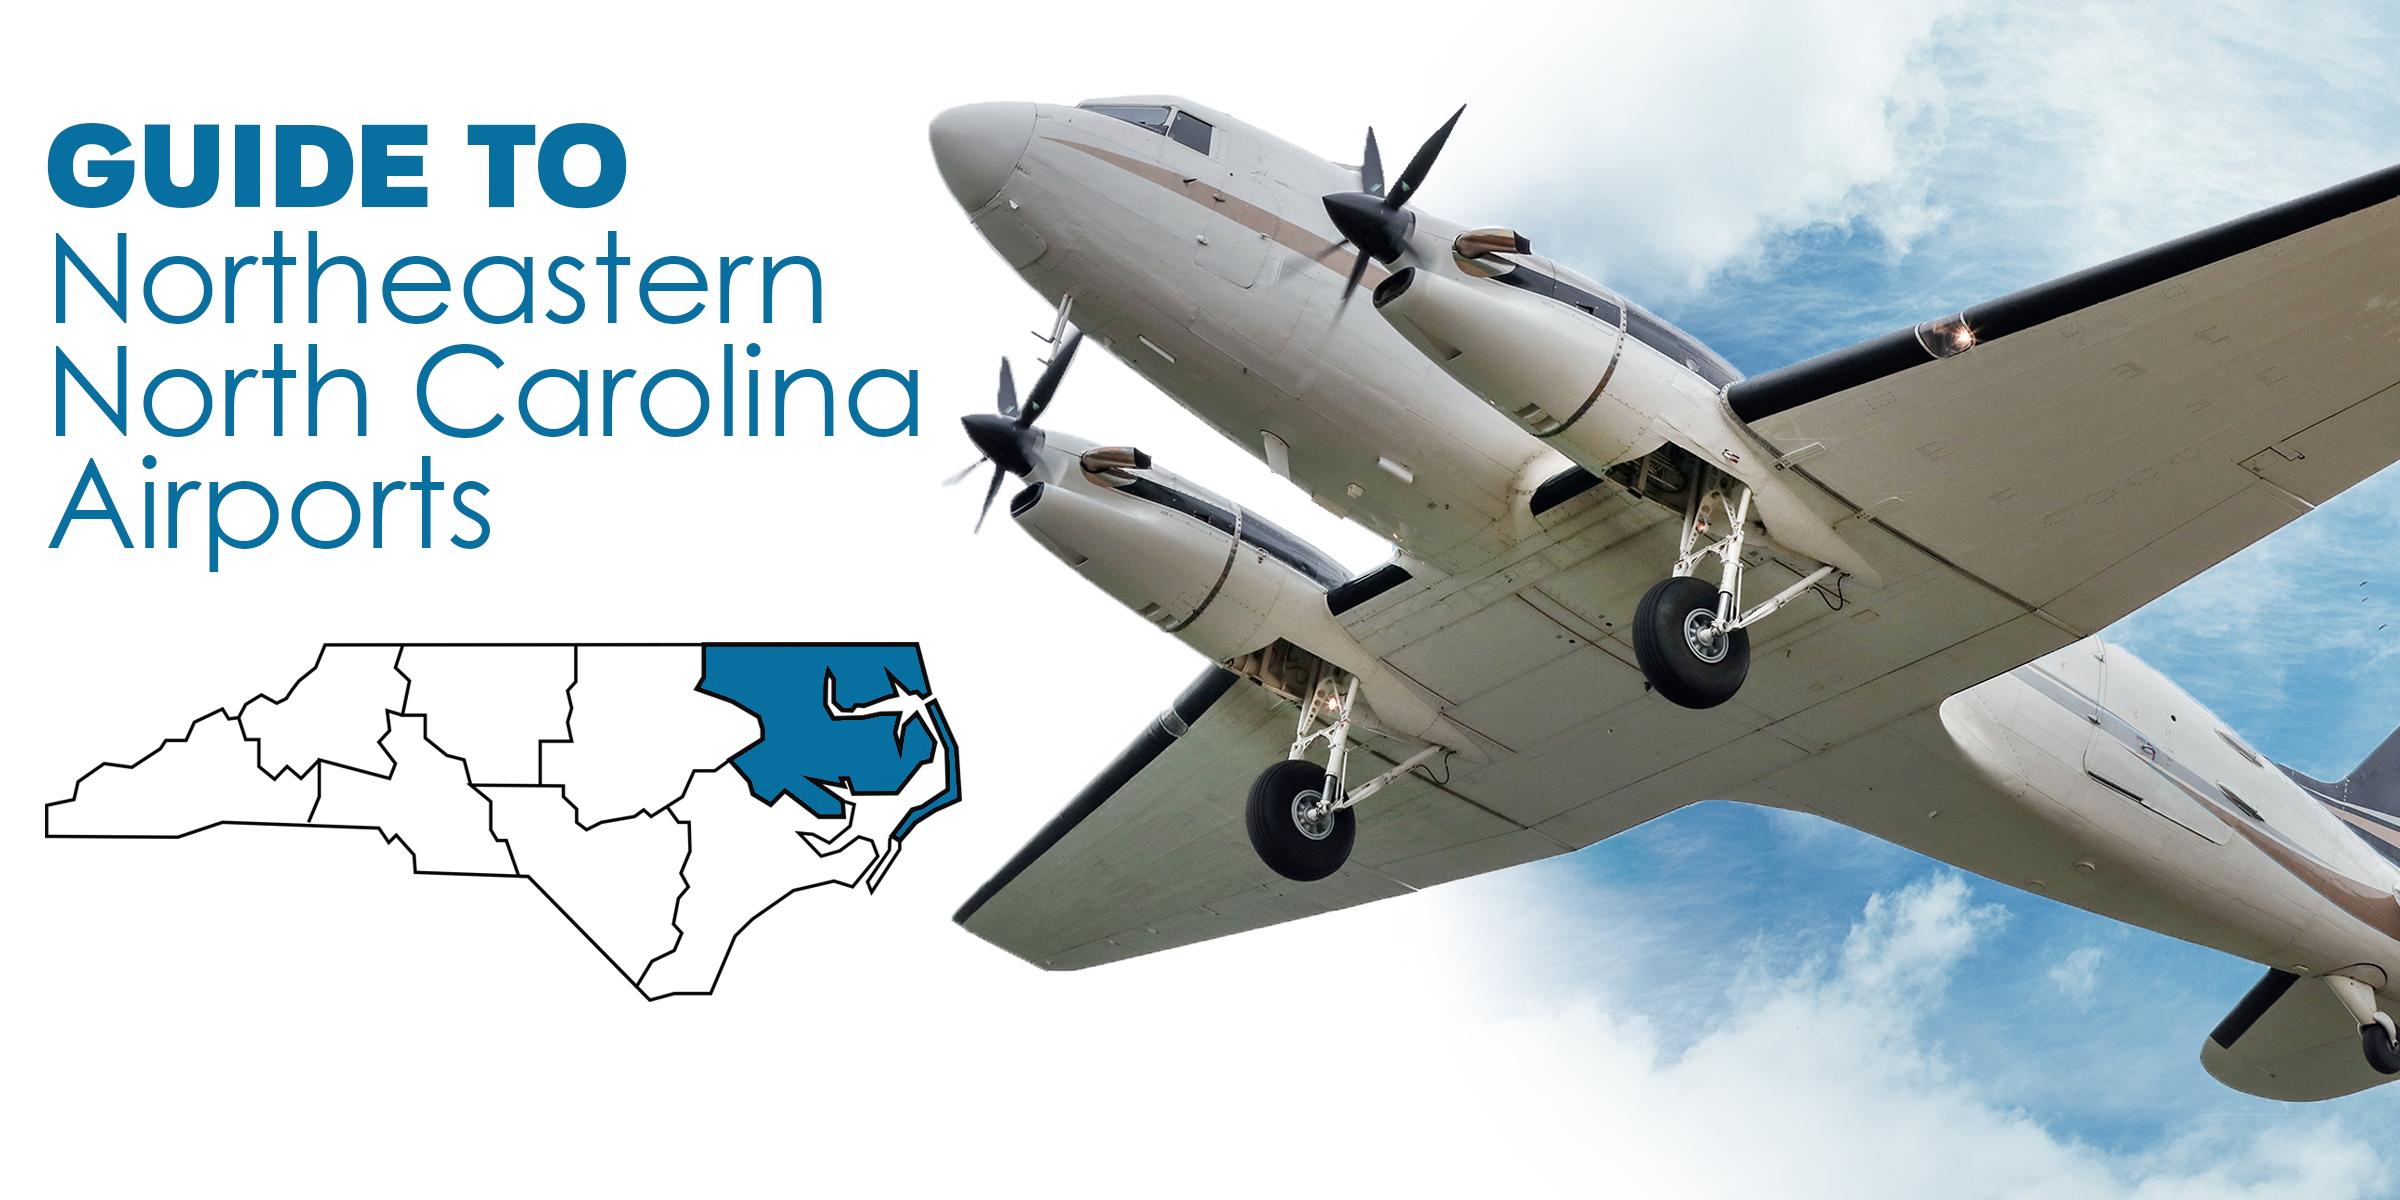 guide to northeastern northcarolina airplanes header_V1